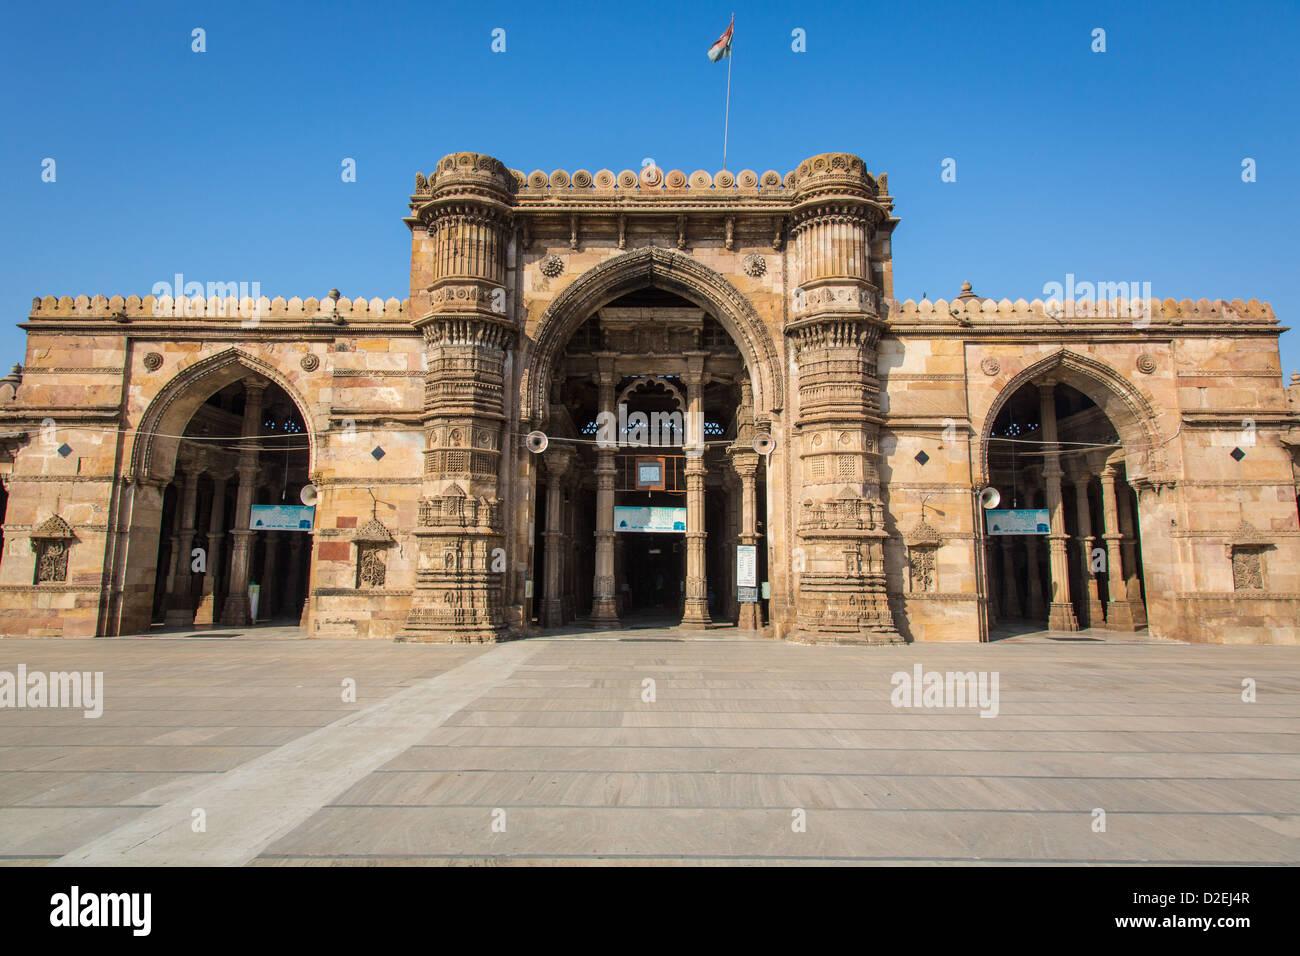 Jama Masjid or Friday Mosque, Ahmedabad, Gujarat, India - Stock Image